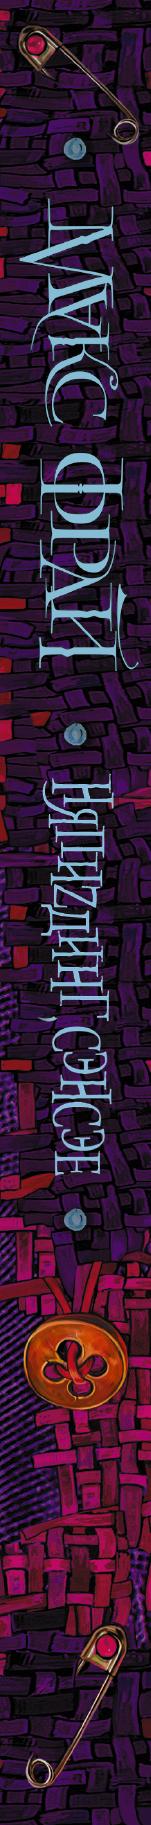 ����Z���� ������